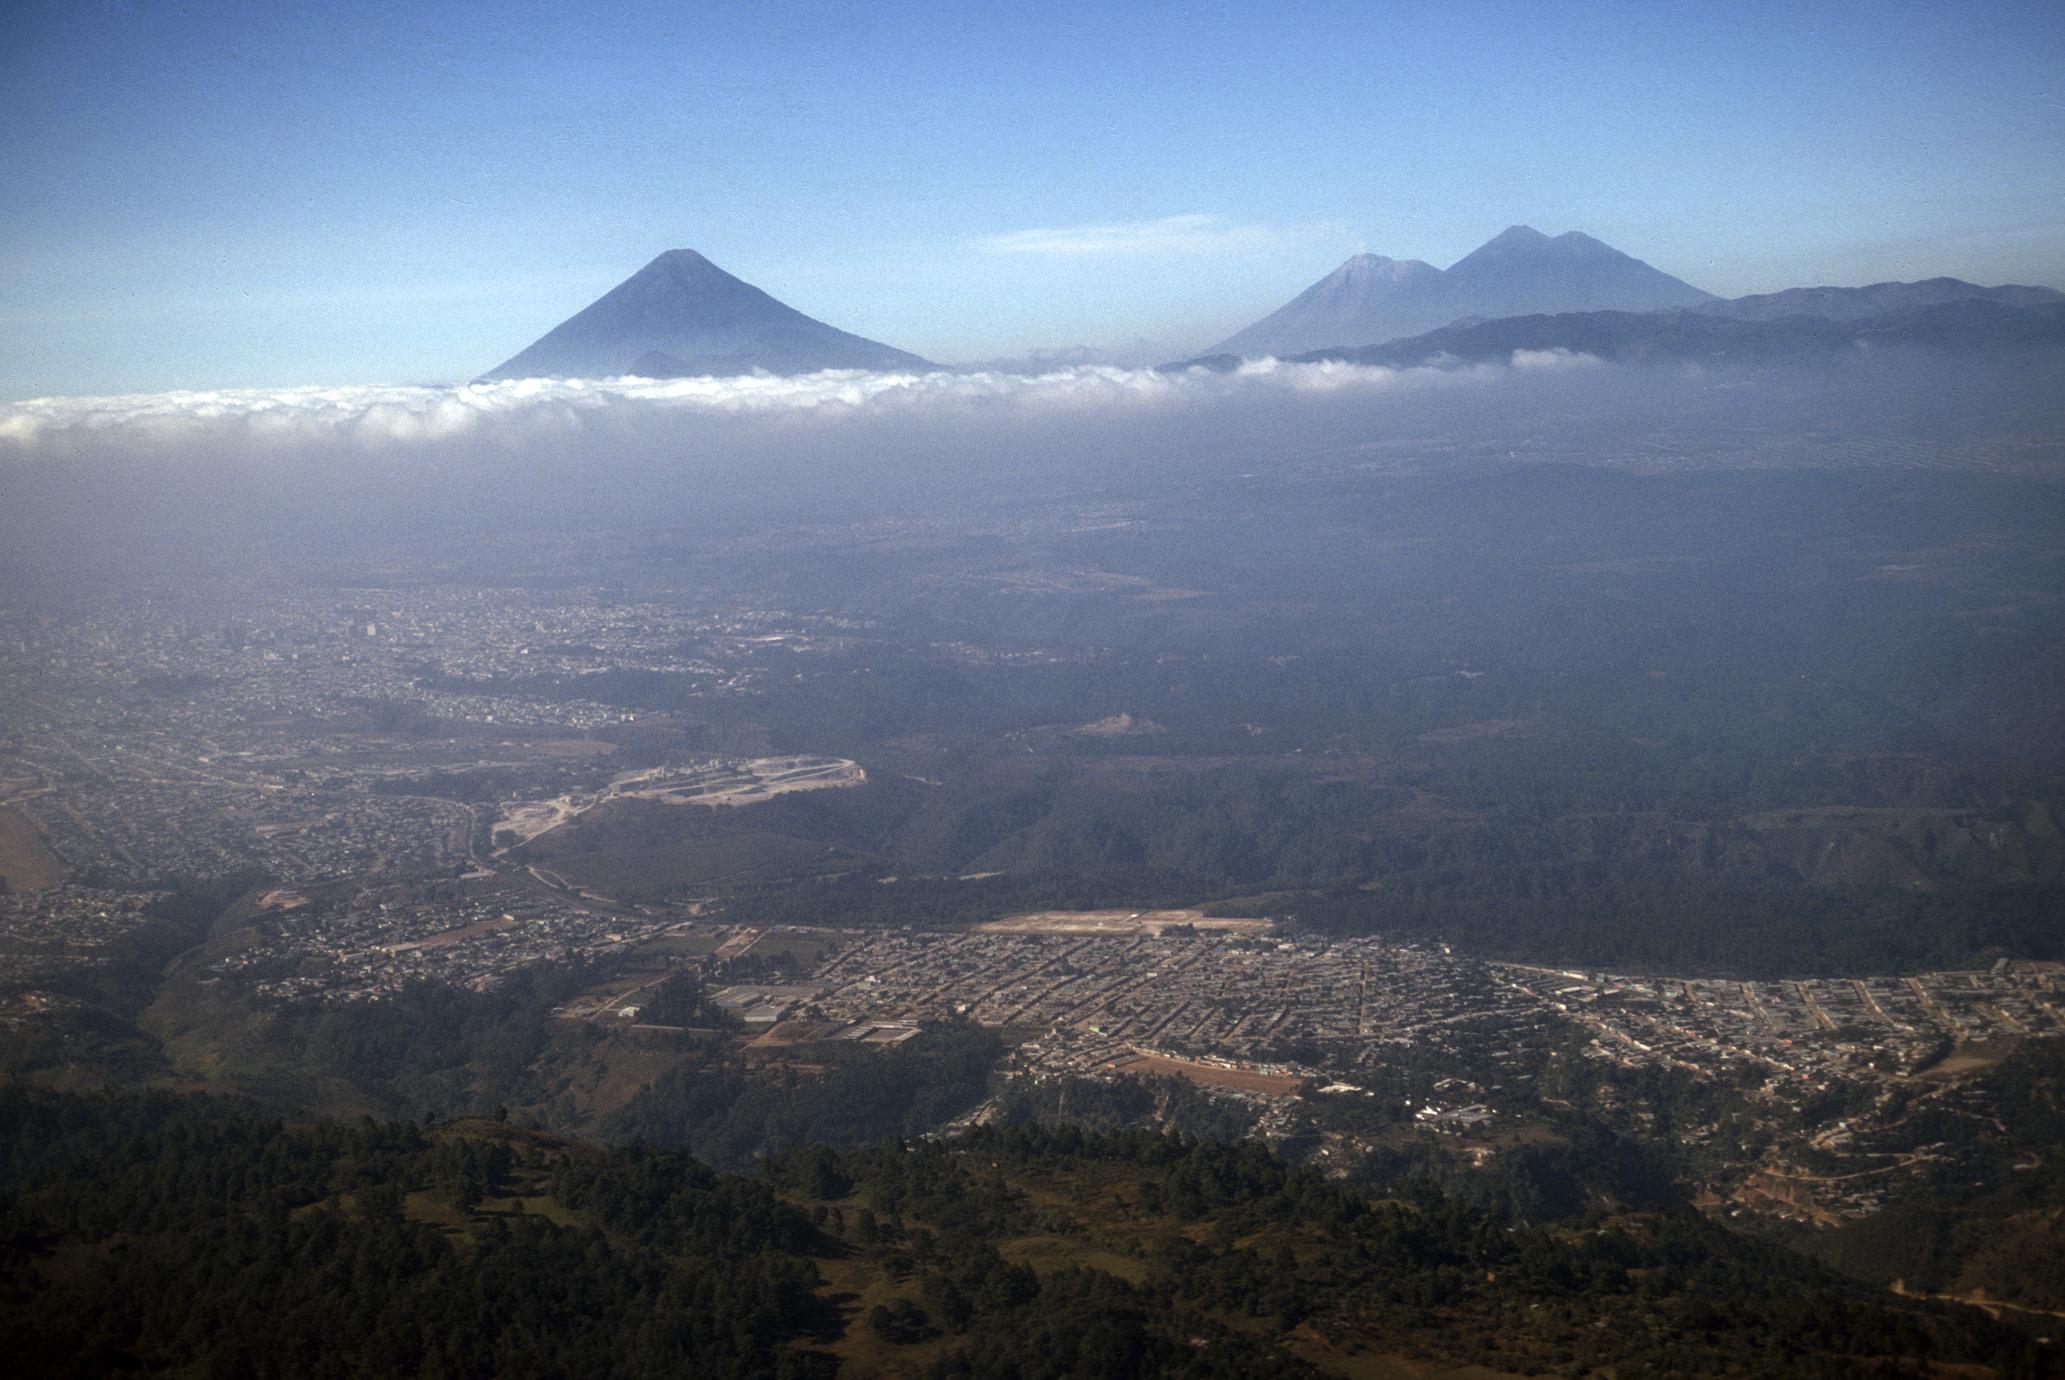 Guatemala City landscape